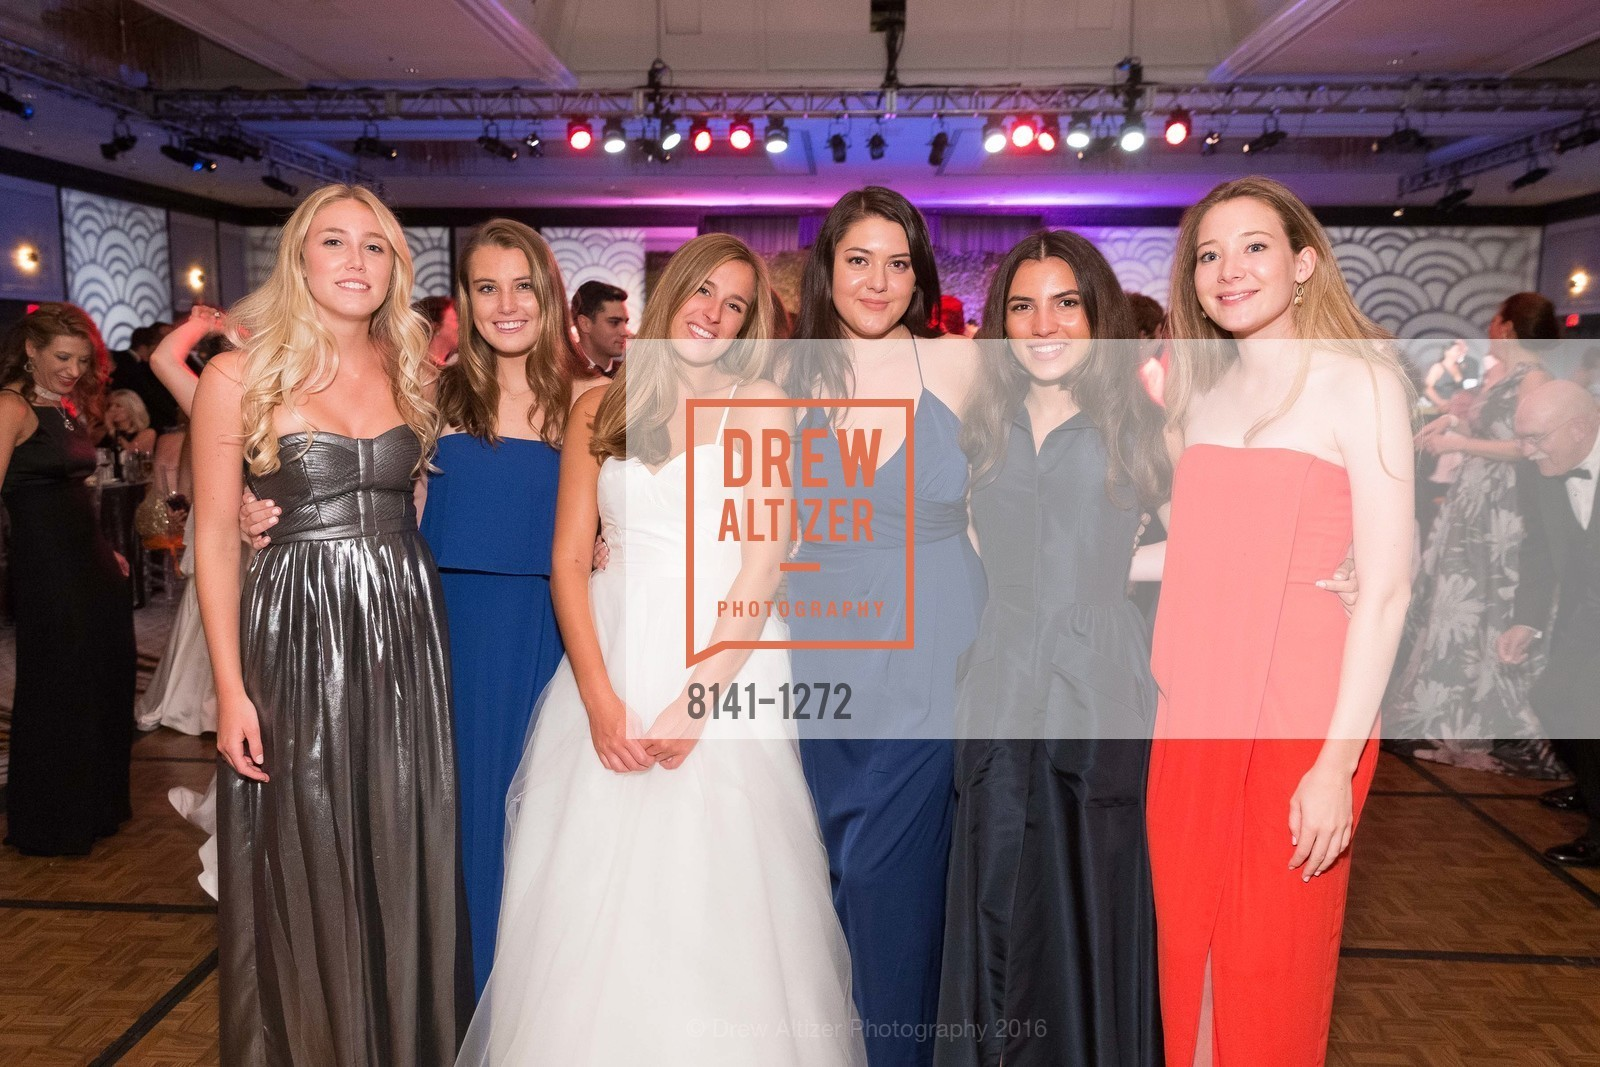 Lauren Sullivan, Kaitlyn Christine Fitzsimmons, Madison Ford, Ellie Garland, Photo #8141-1272